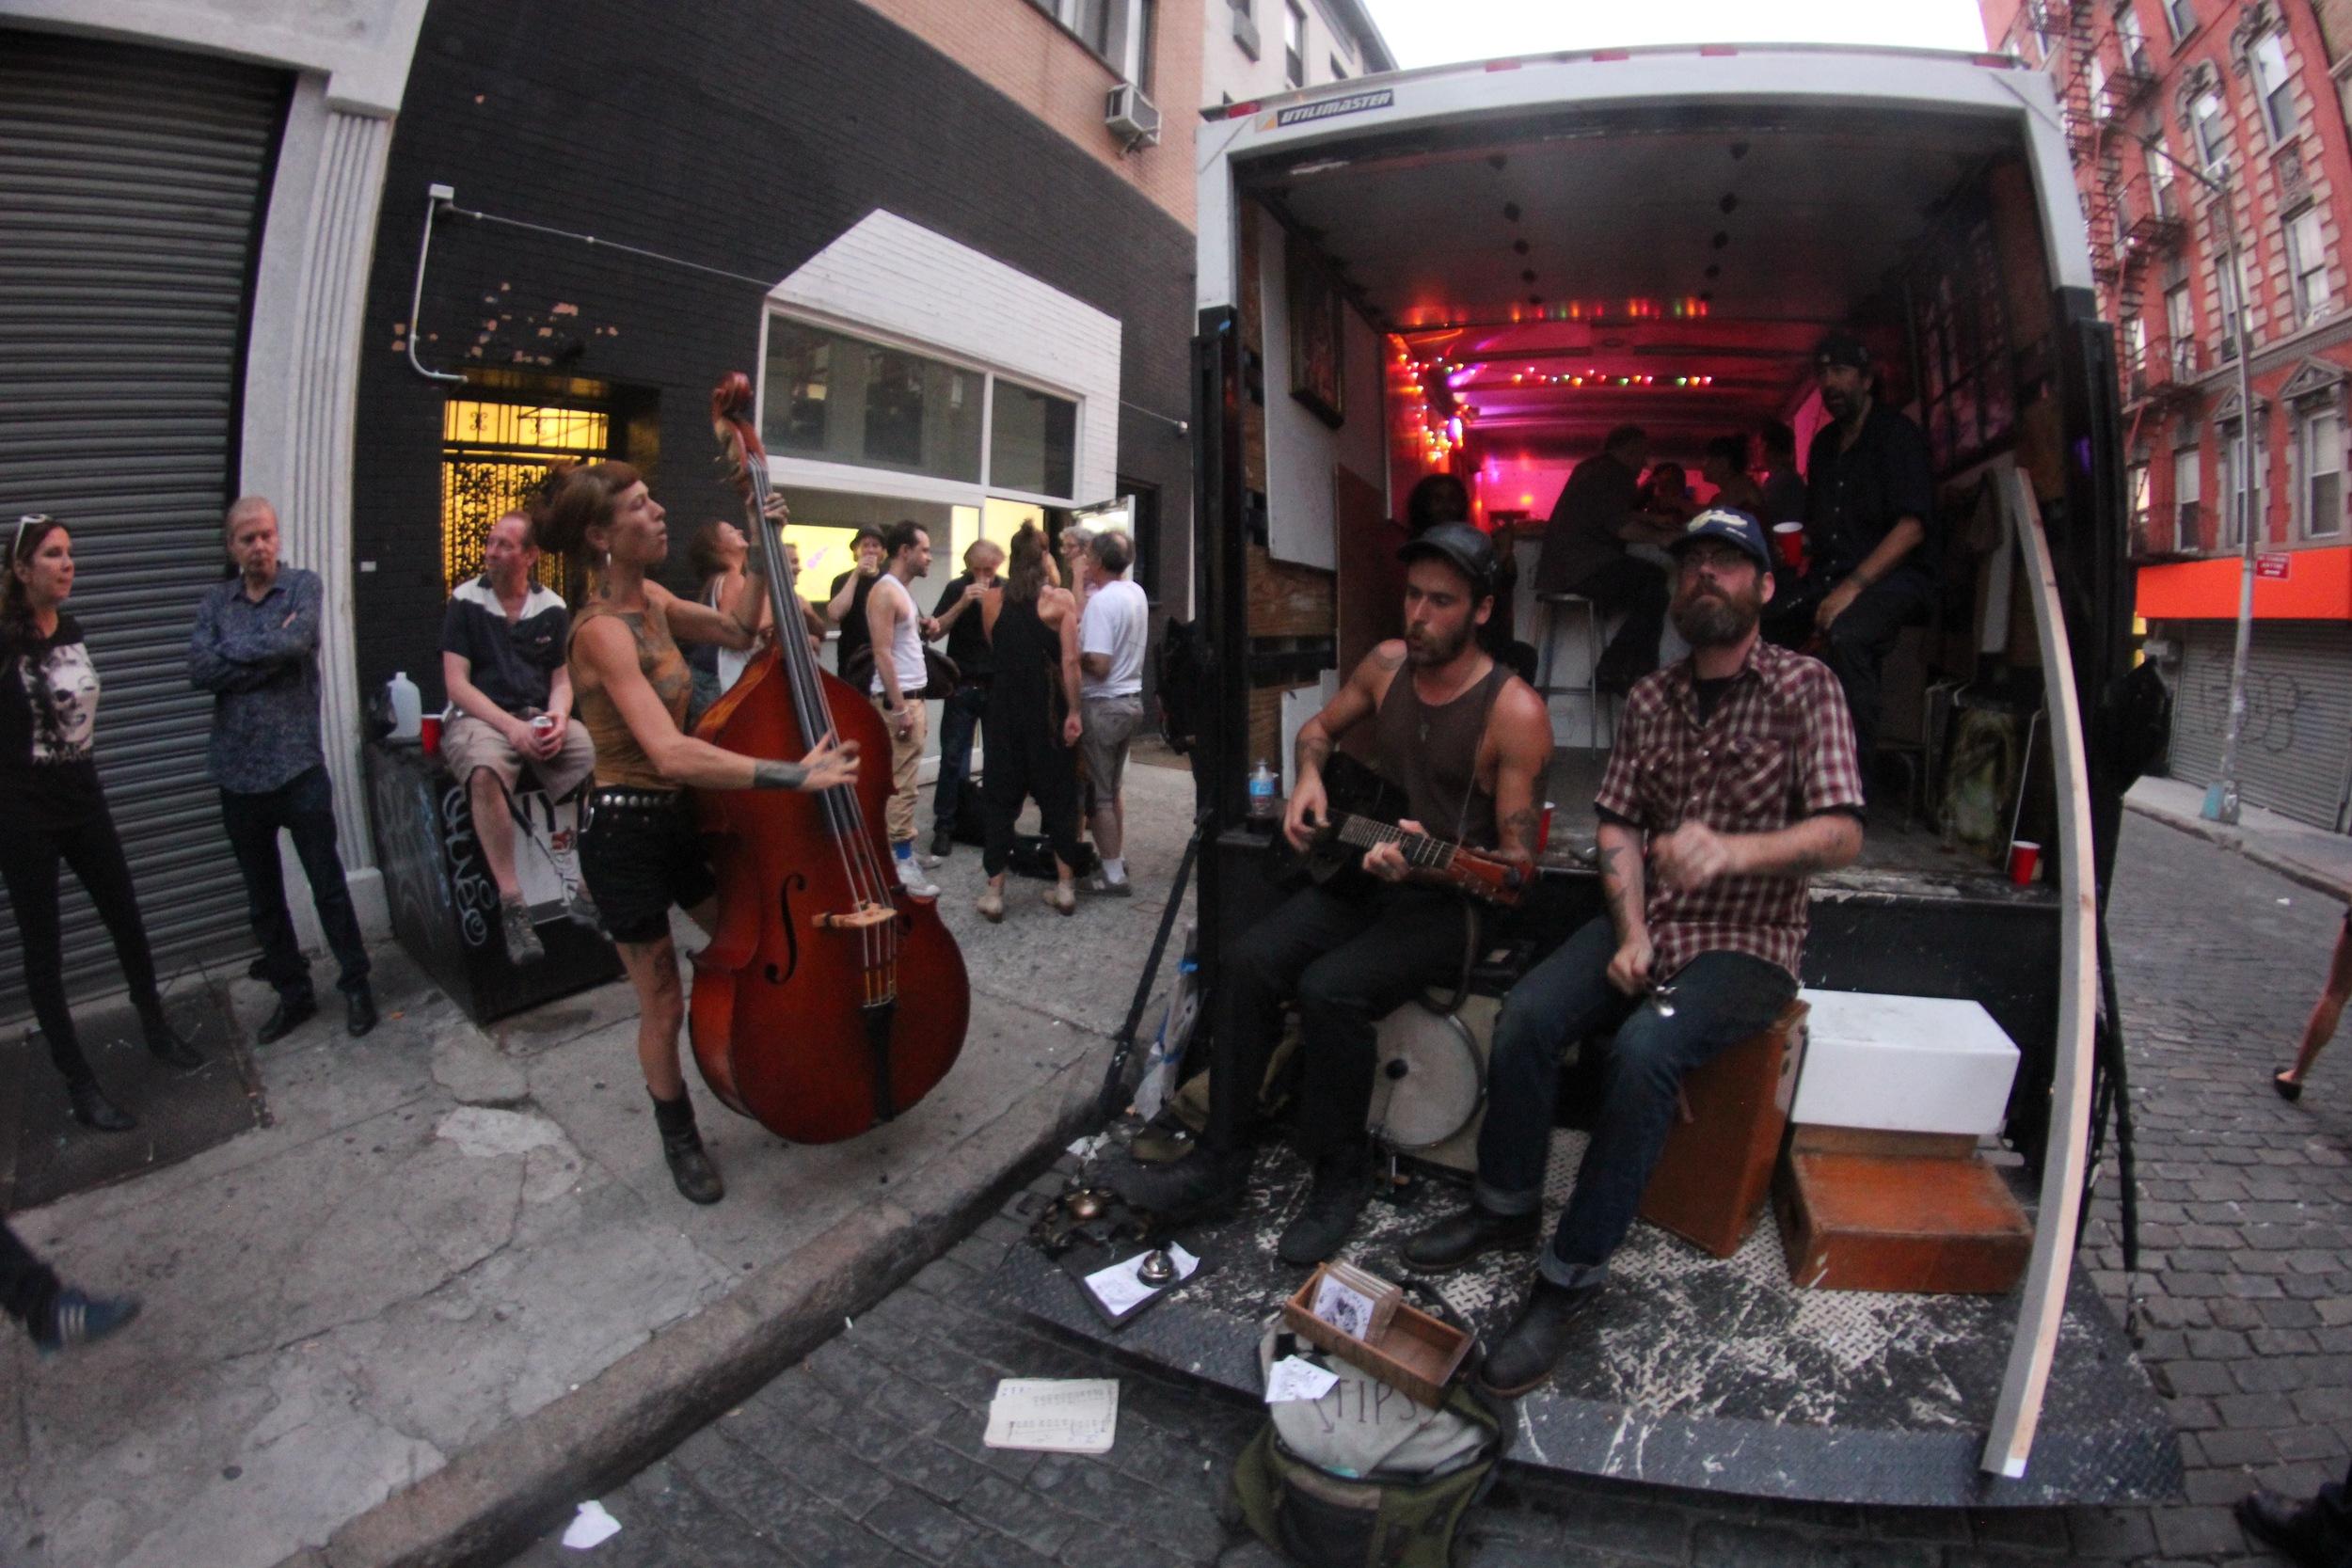 Dan Glass' Mars Bar gallery show and Mars box truck w//outlawritual